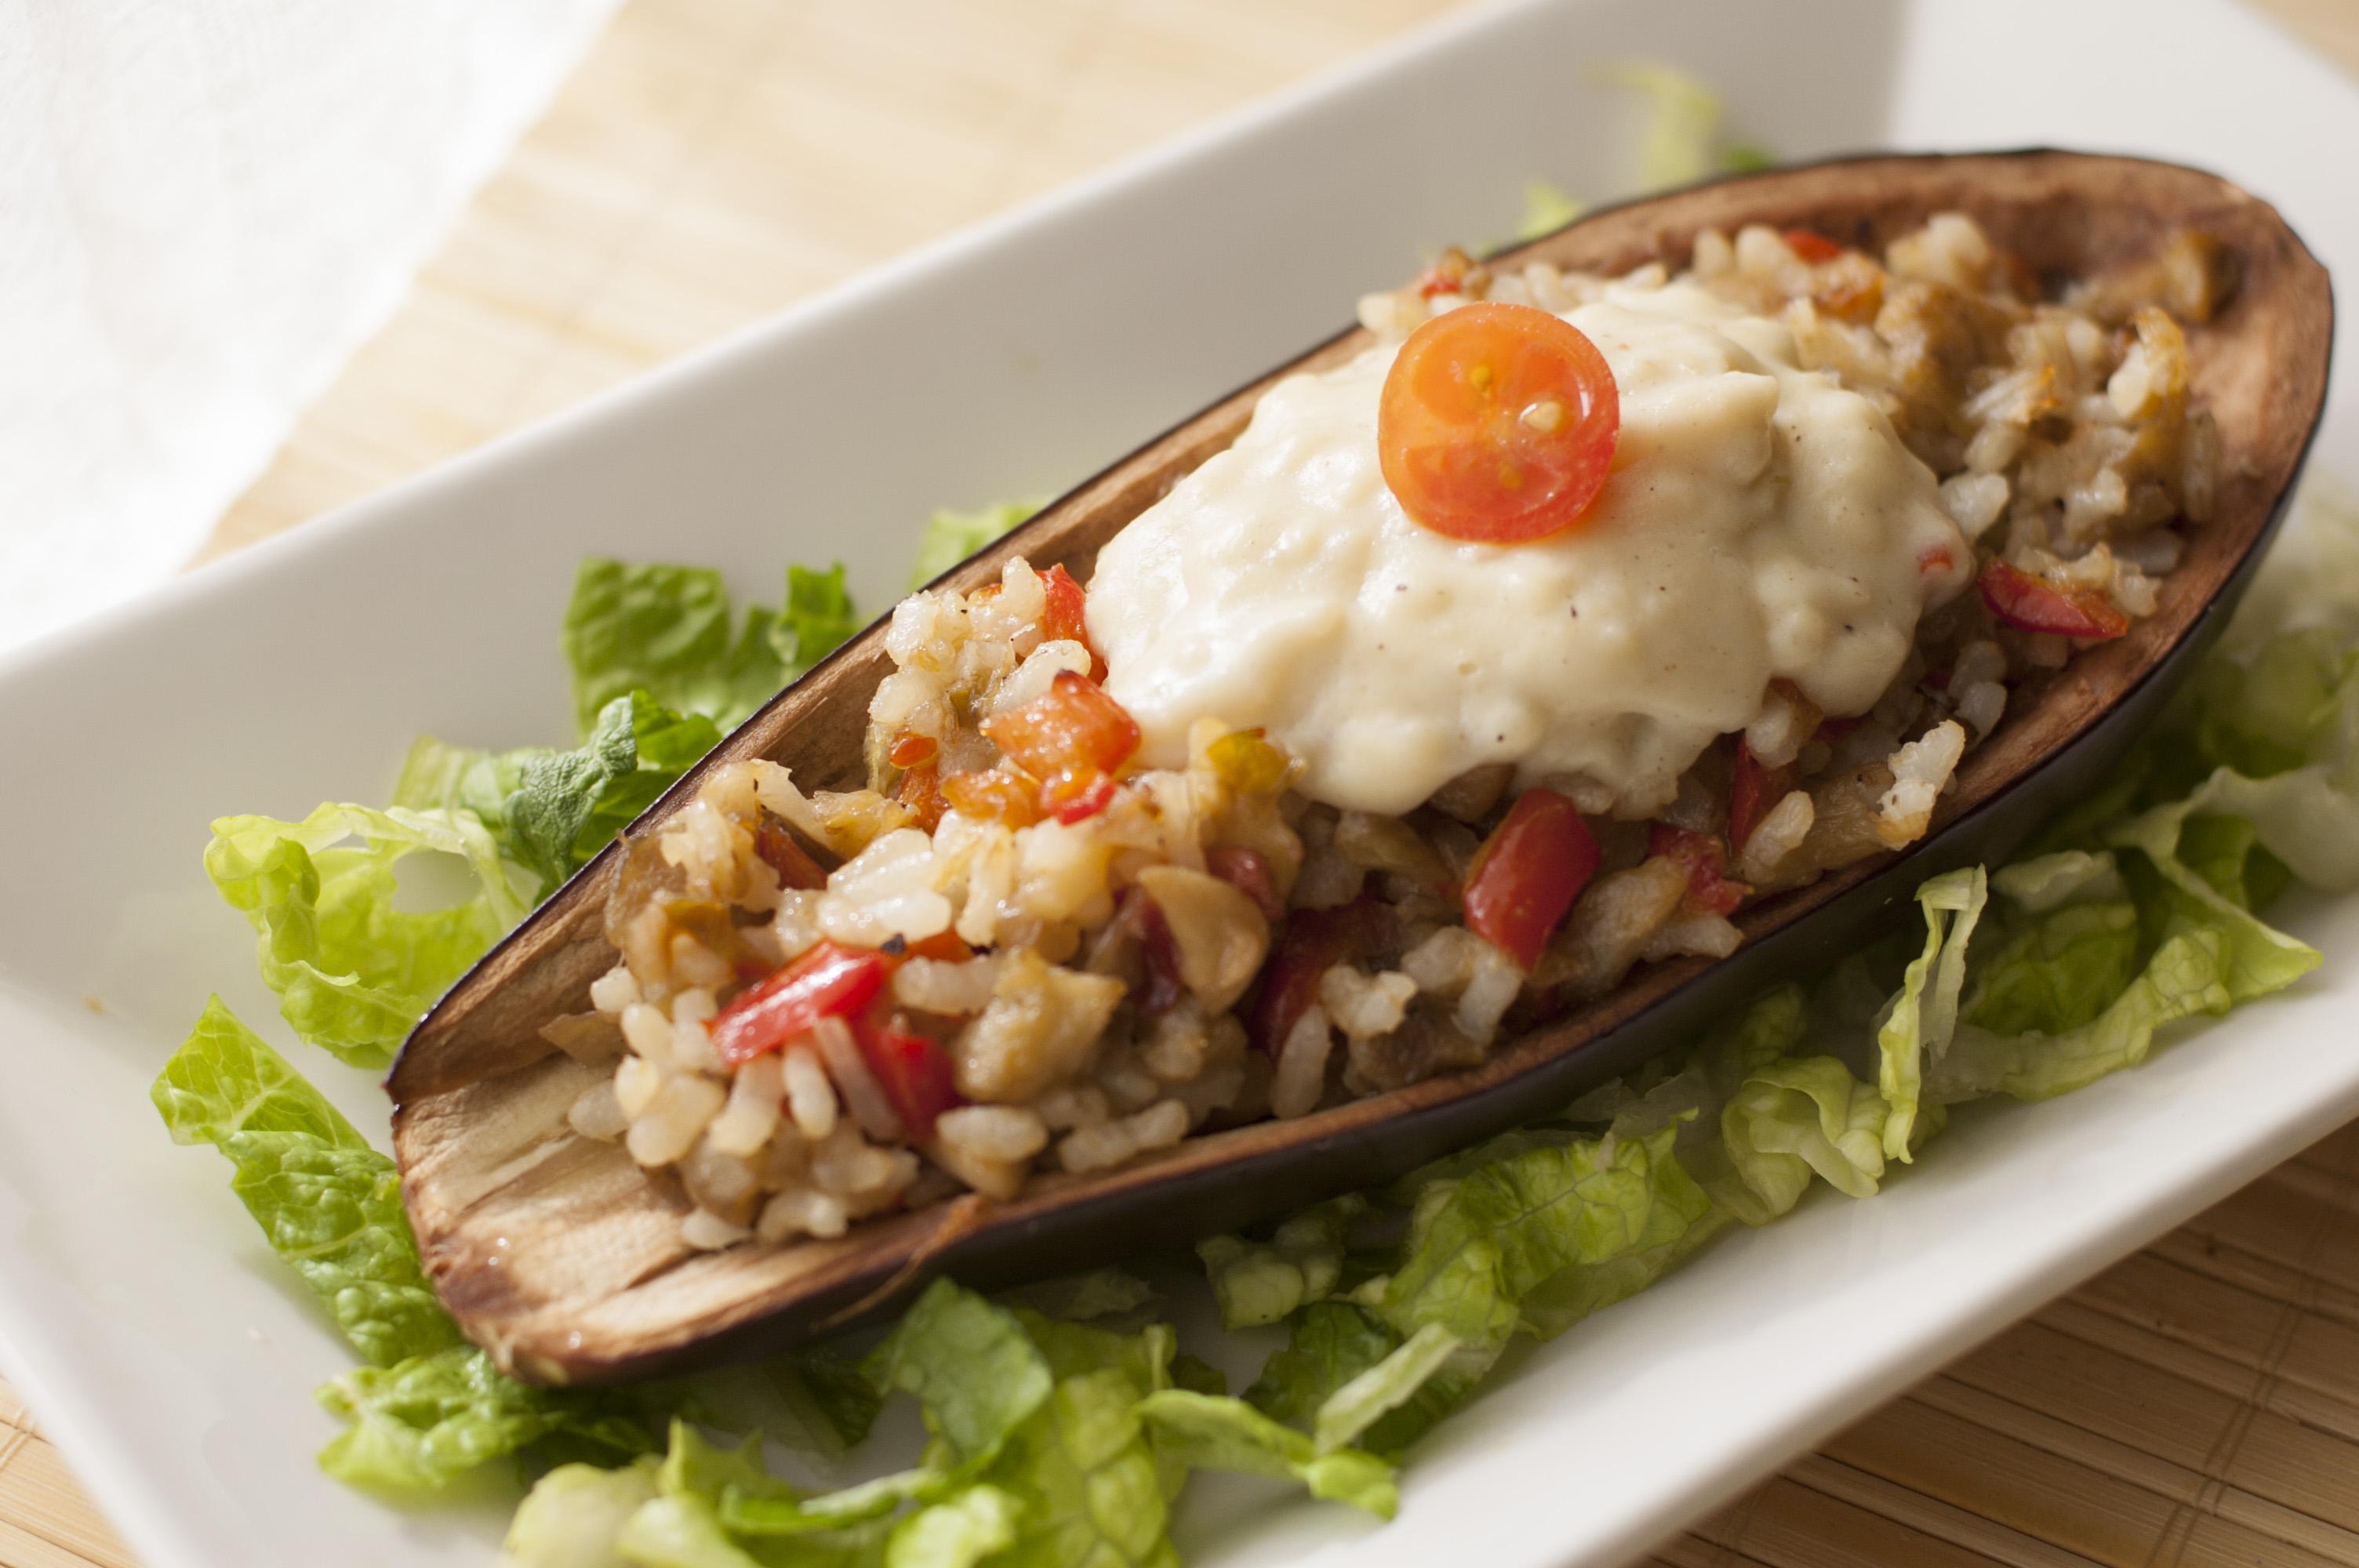 Berenjenas rellenas de arroz Mis recetas veganas